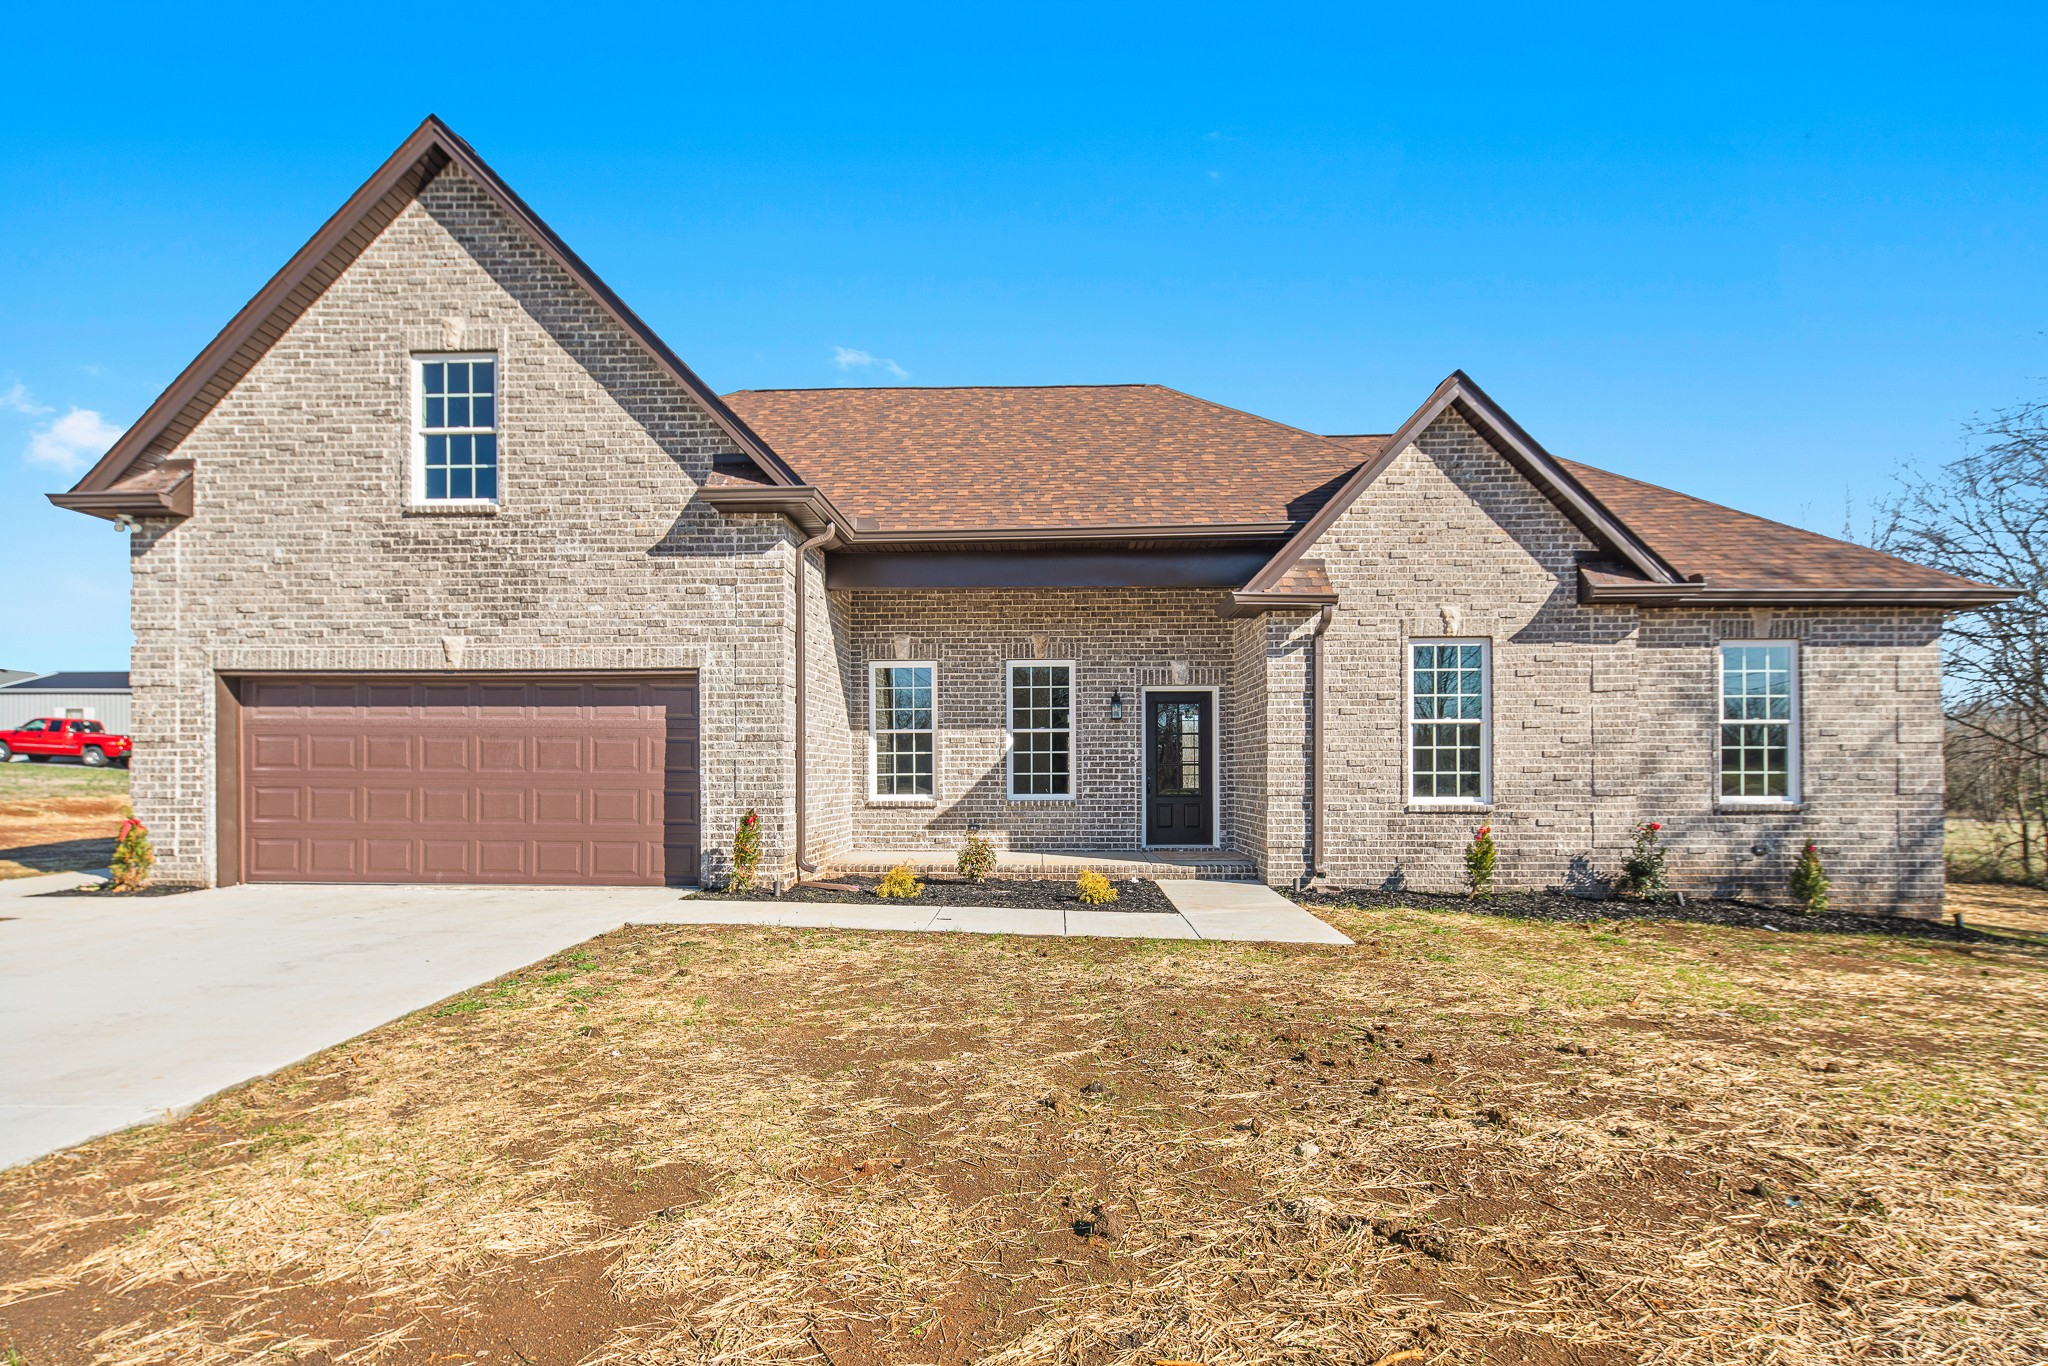 818 Coopertown Rd, Unionville, TN 37180 - Unionville, TN real estate listing